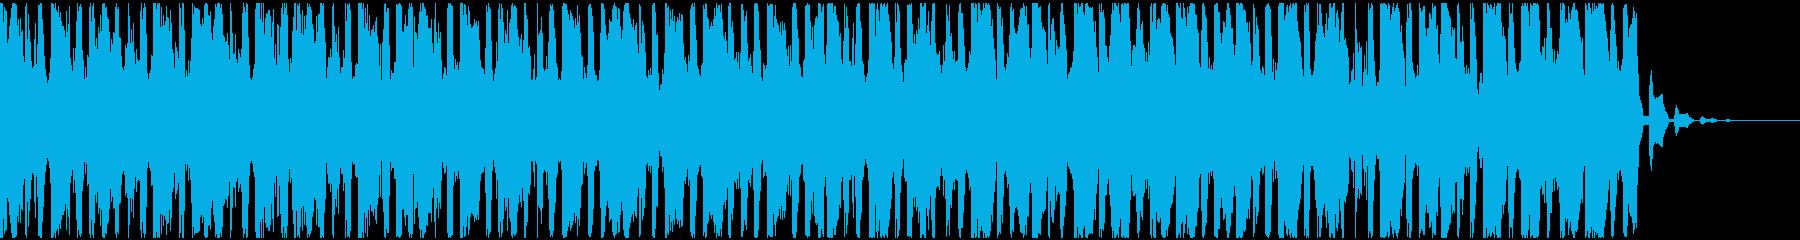 【EDM】トランス、ジングル2の再生済みの波形